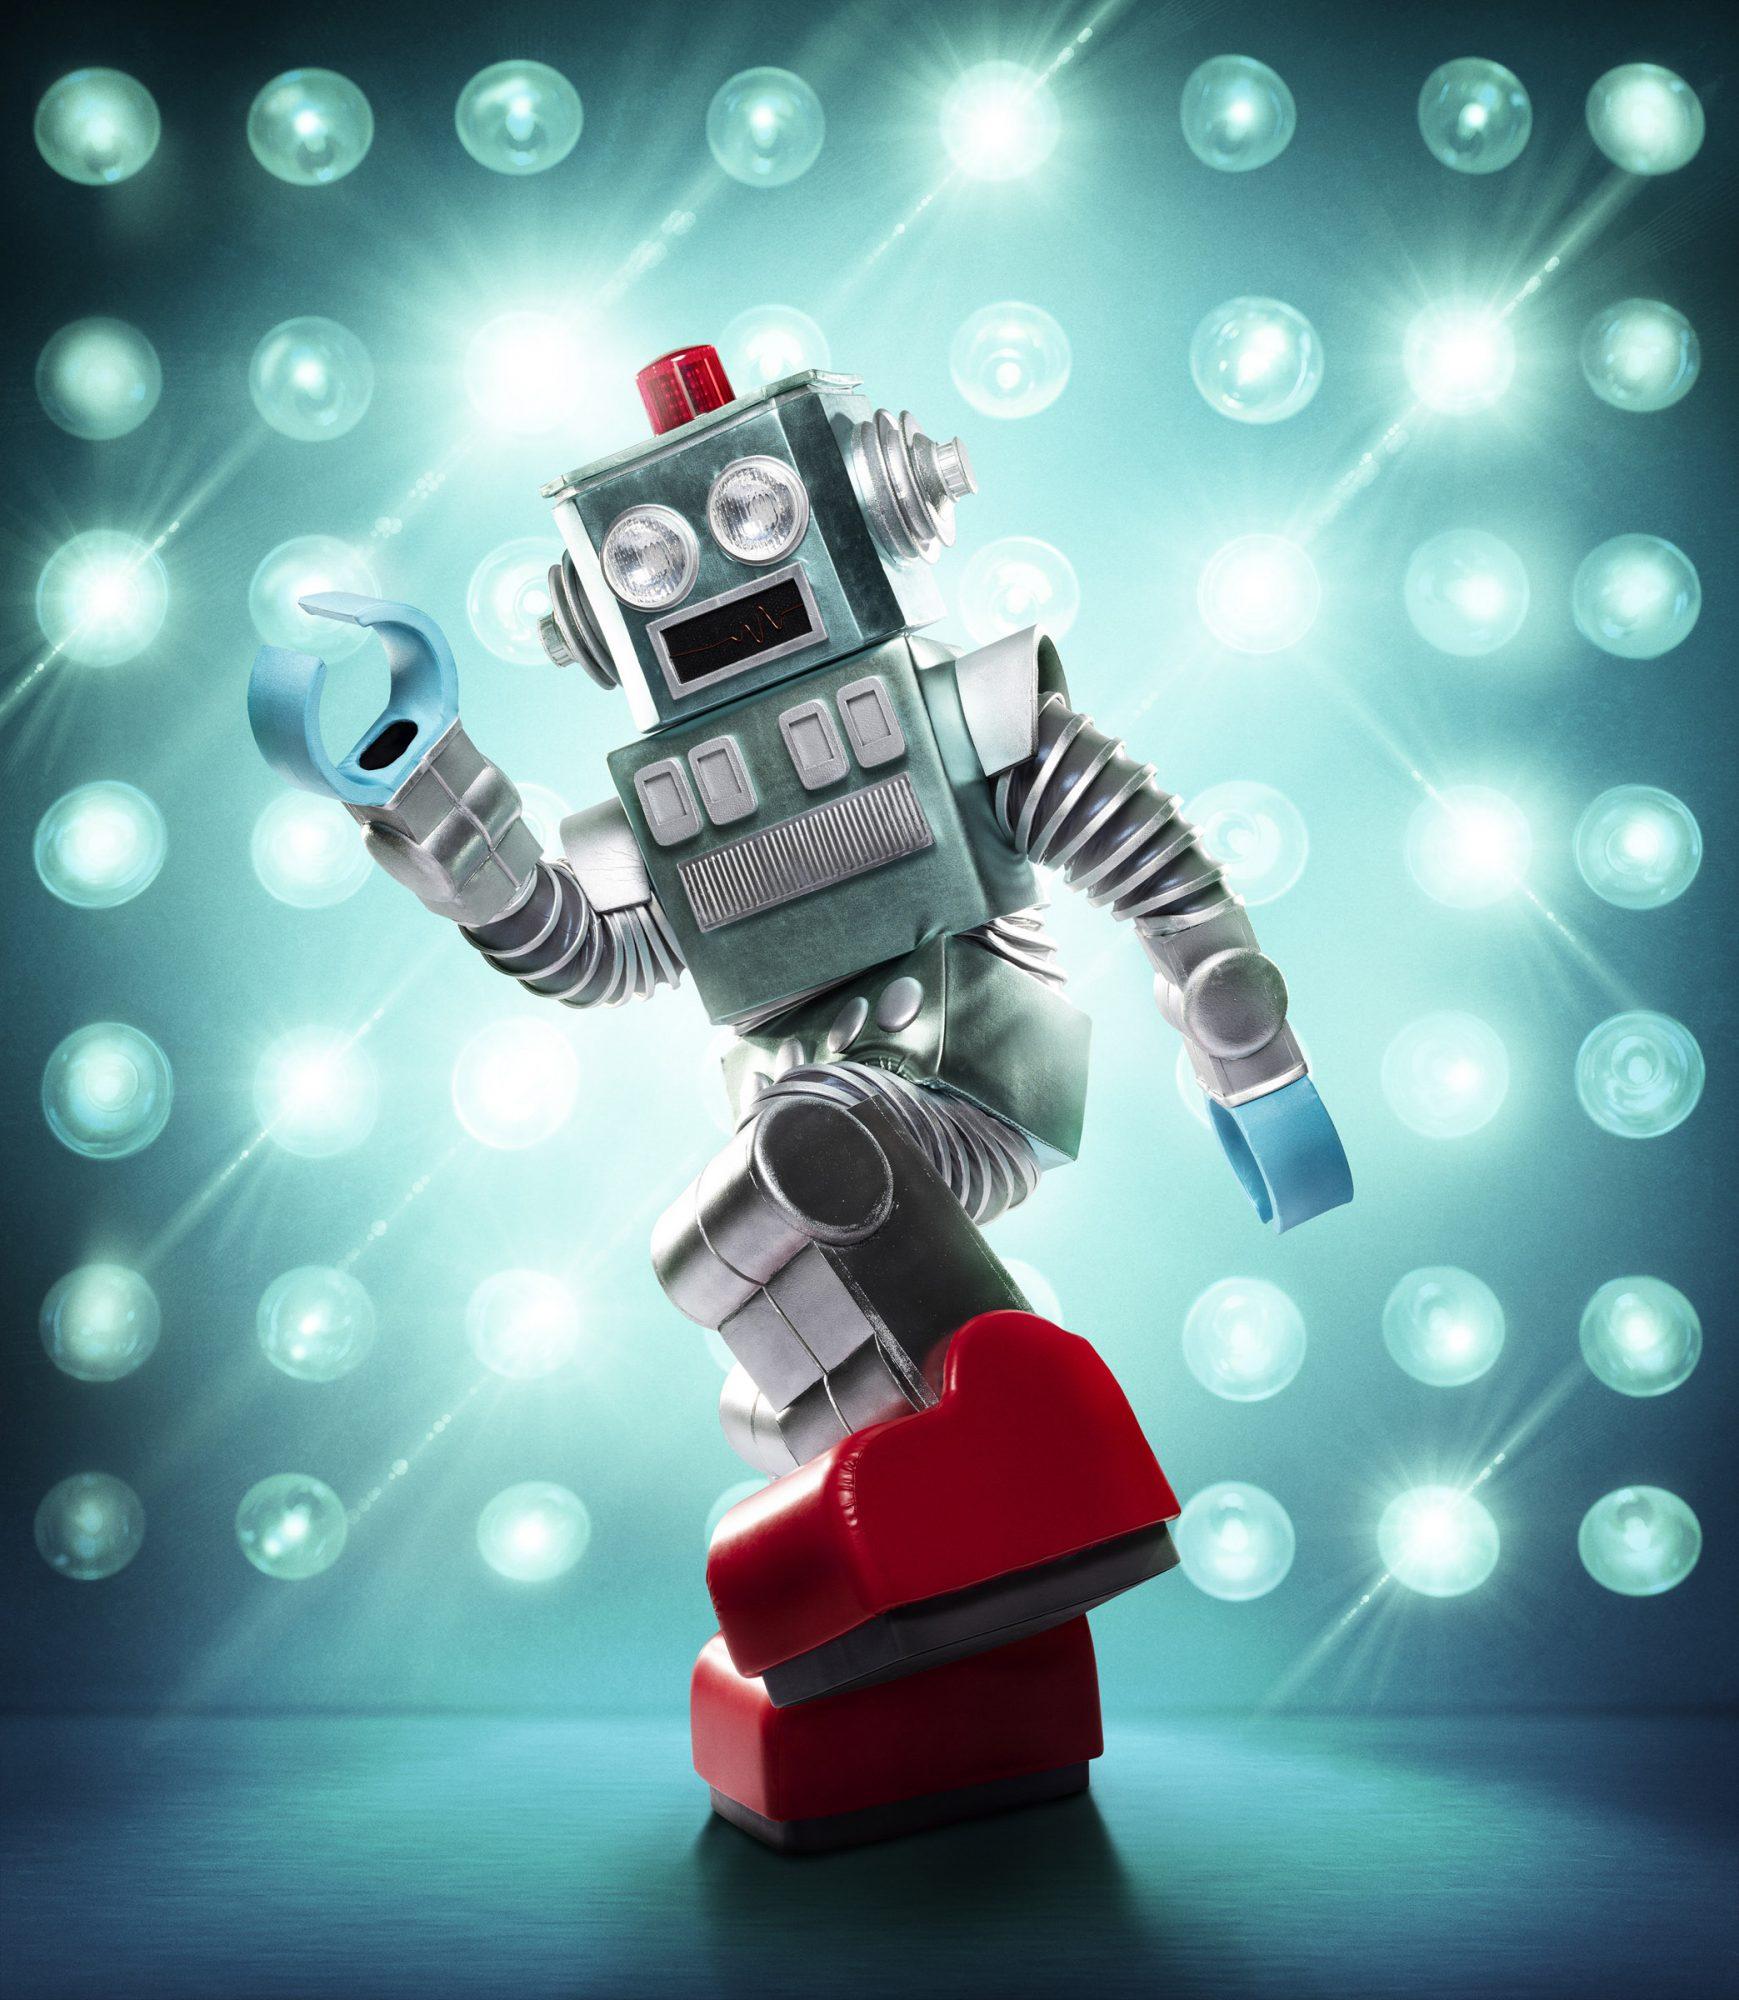 THE MASKED SINGER: The Robot. CR: Michael Becker / FOX. © 2020 FOX MEDIA LLC.